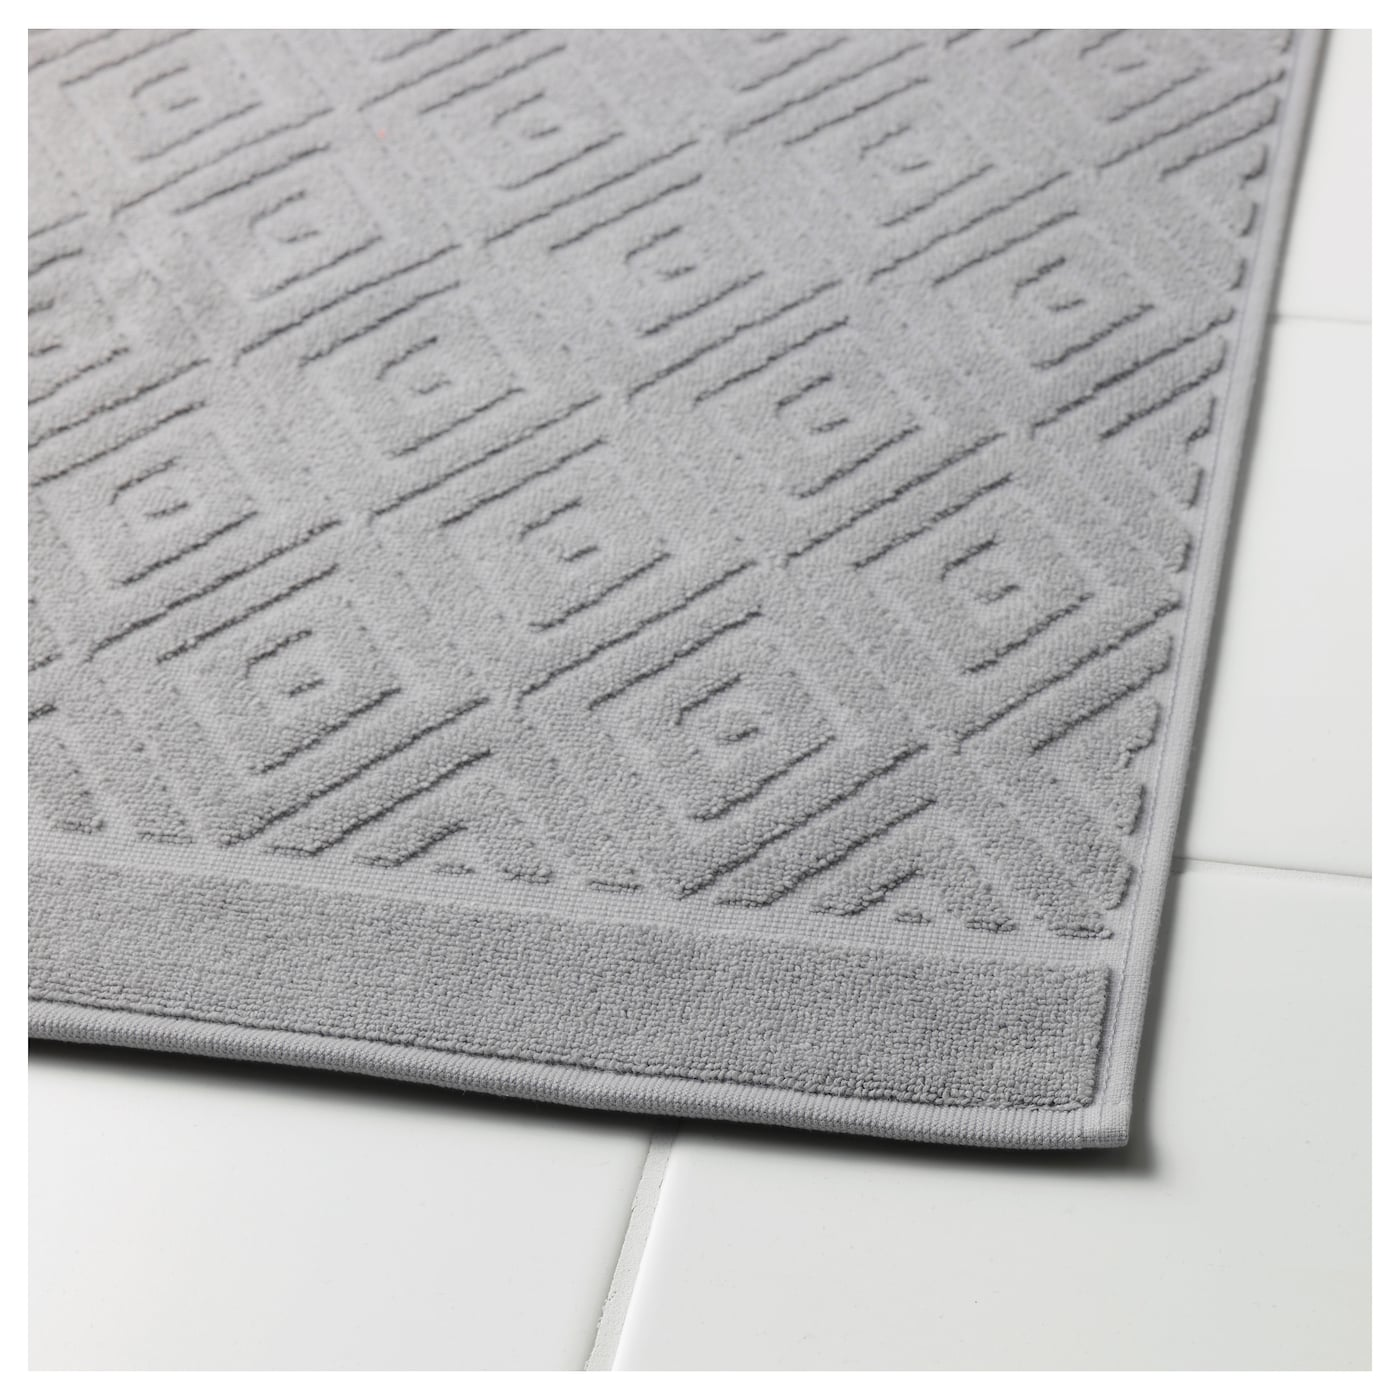 F laren tapis de bain gris moyen 50x80 cm ikea - Tapis gris ikea ...